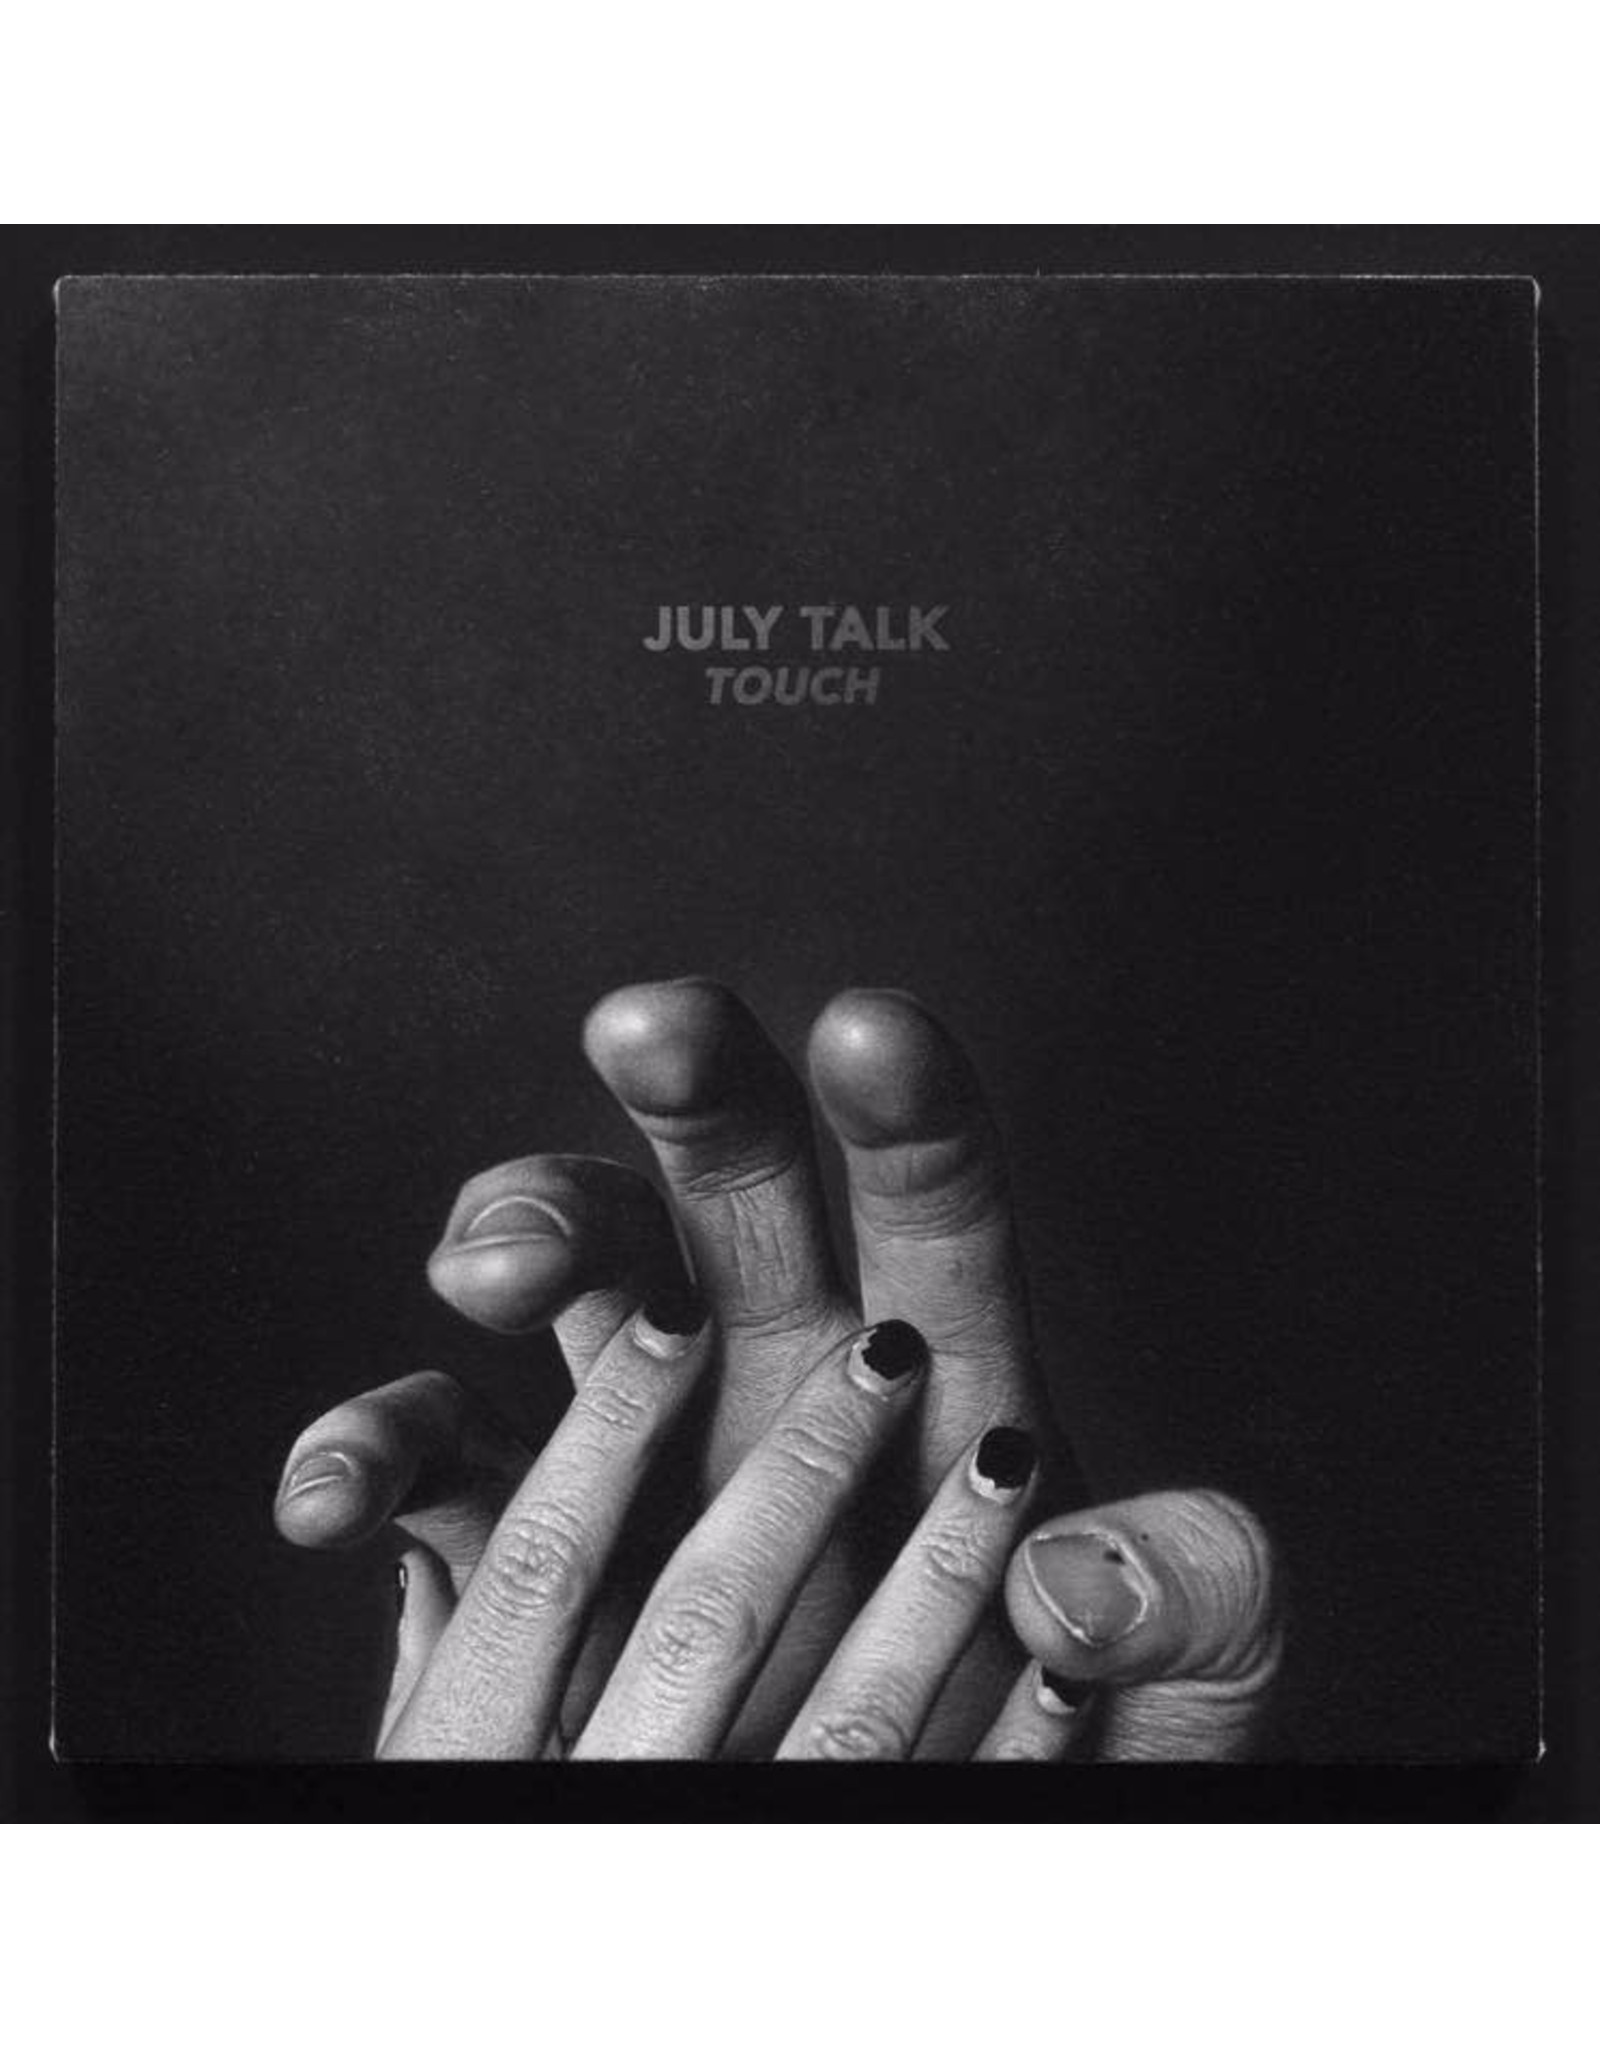 July Talk - Touch LP